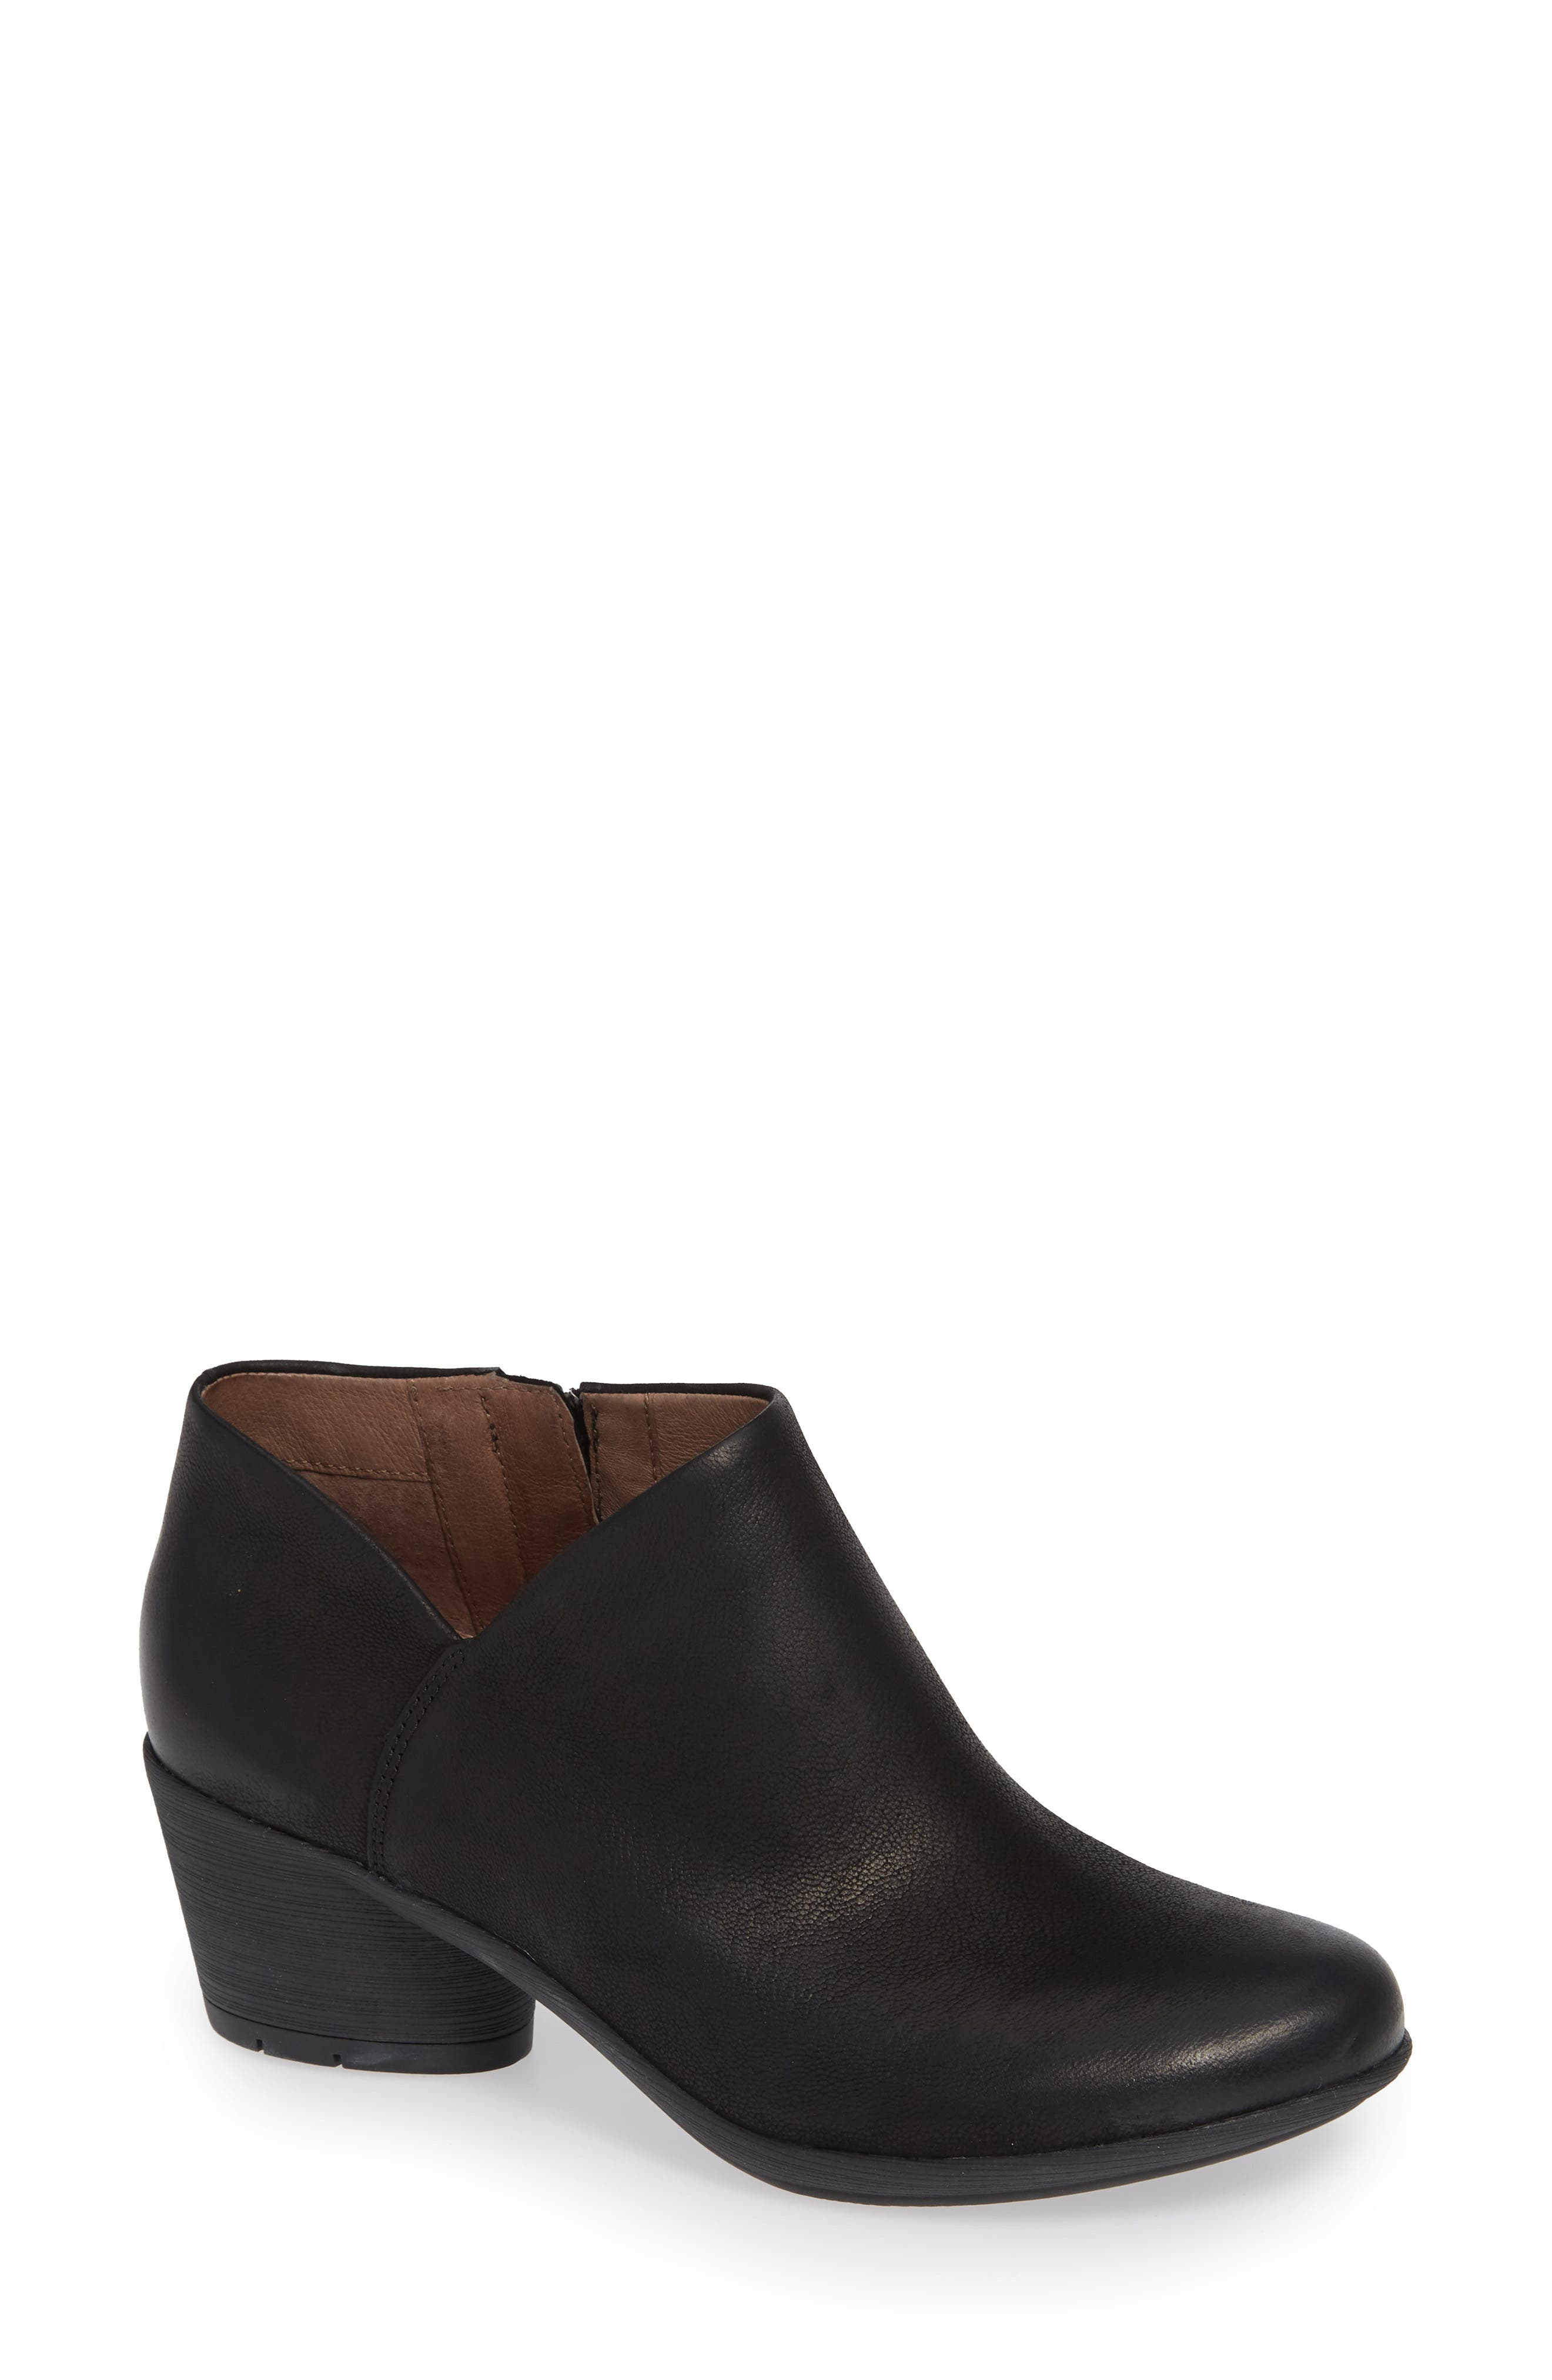 Dansko Raina Boot- Black